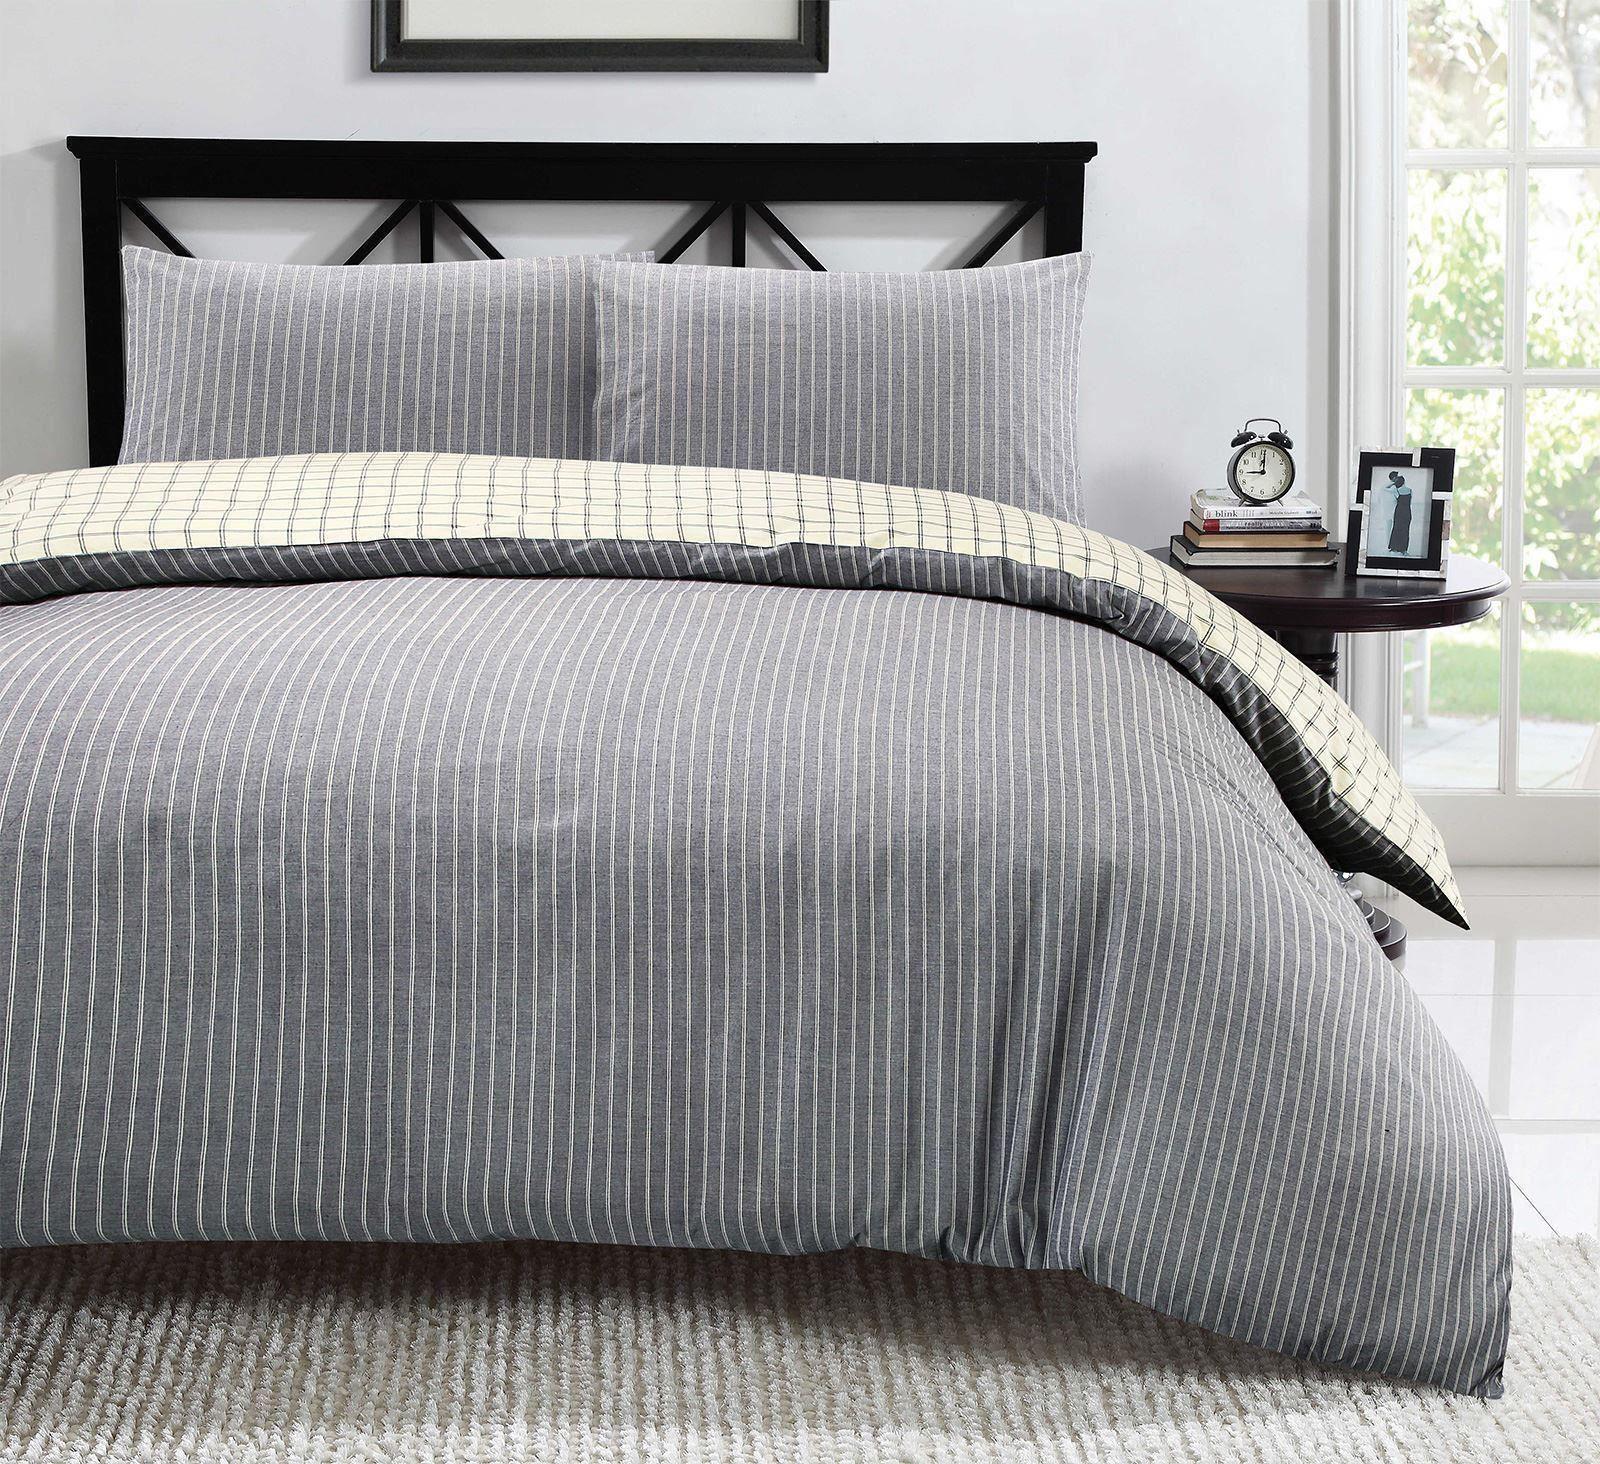 100-algodon-duvet-cover-set-raya-Cuadros-Reversible-Ropa-De-Cama-Individual-Doble-King miniatura 17